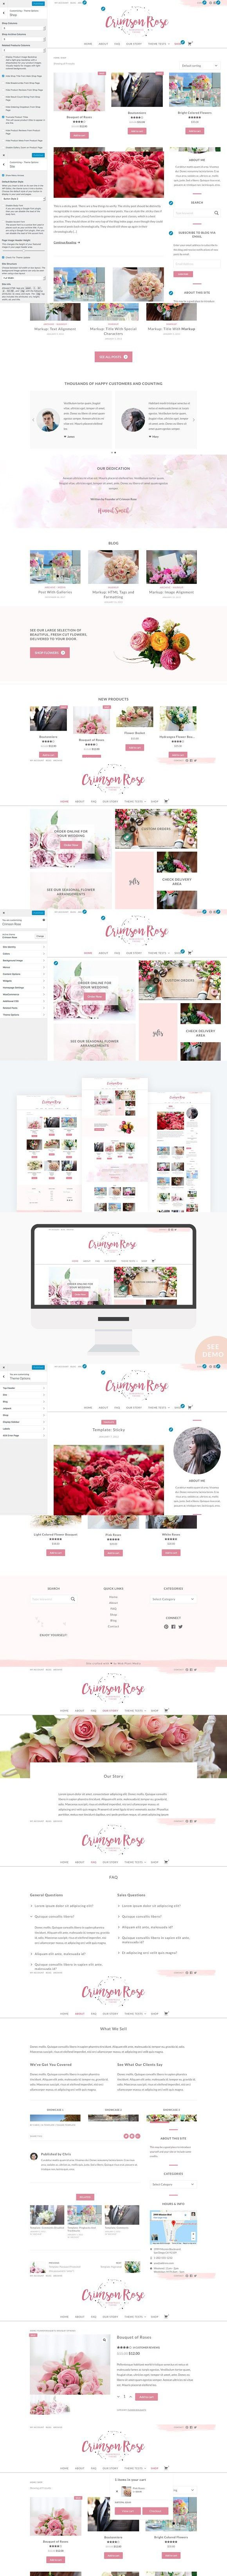 Crimson Rose Wordpress Theme Ecommercetheme Shoptheme Theme Ecommerce Themes Wordpress Theme